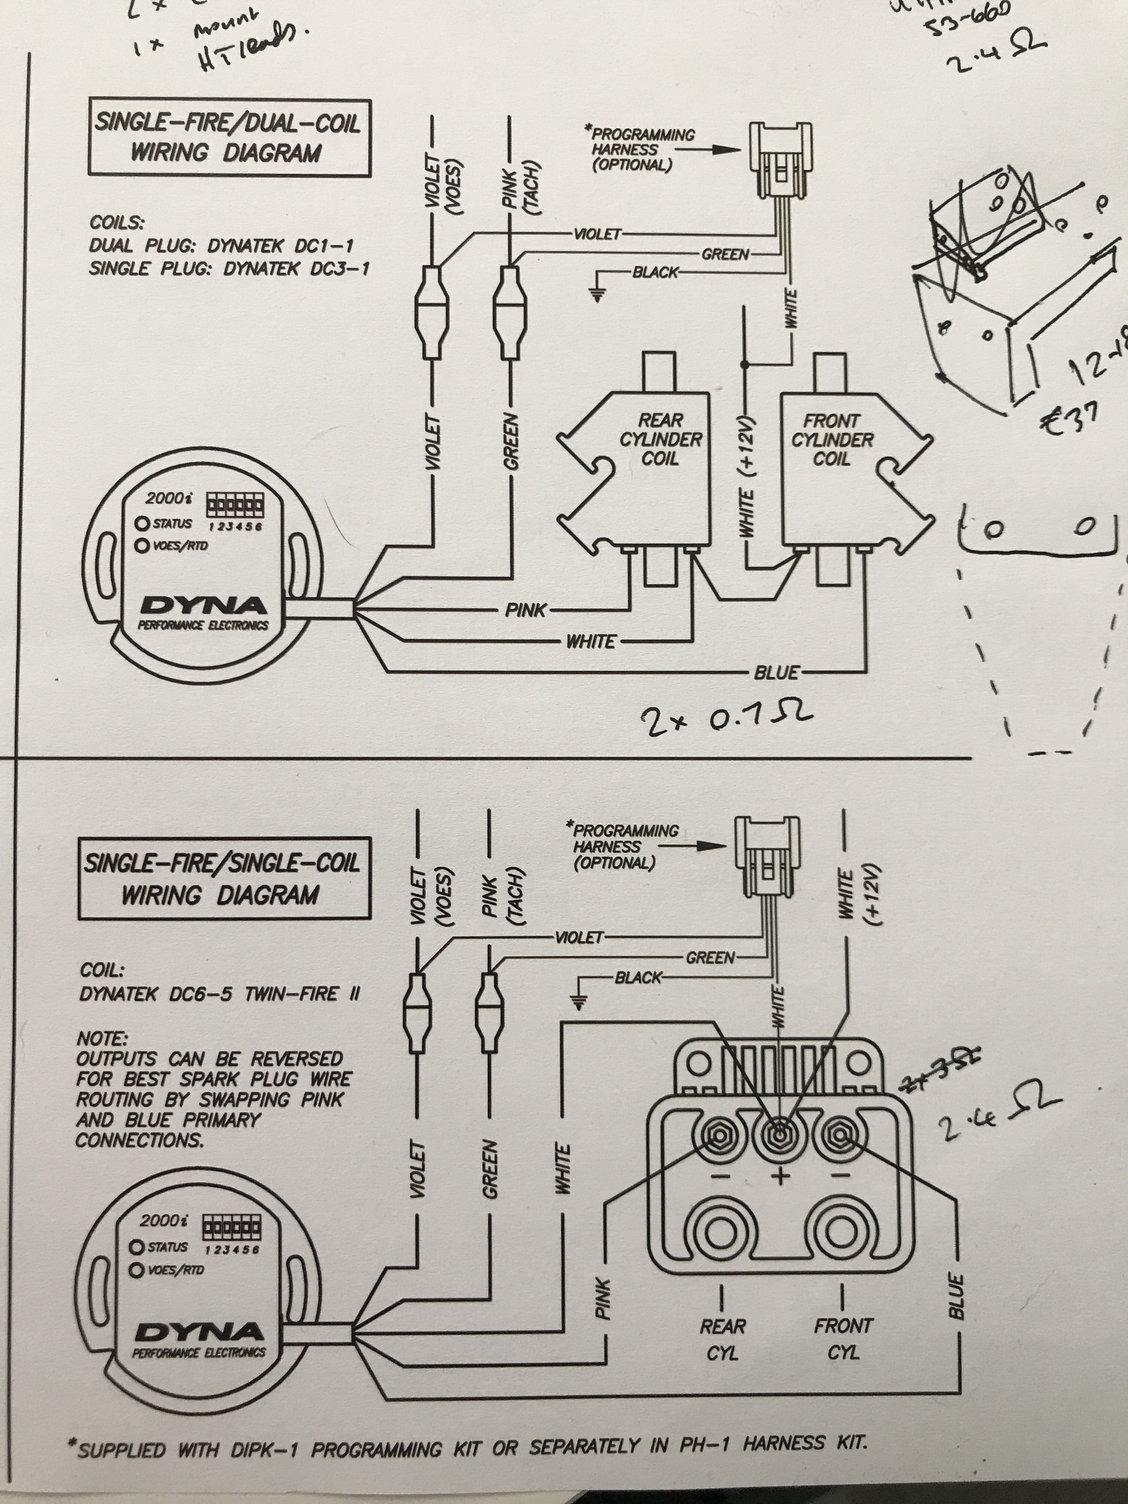 Harley Davidson Coil Wiring Diagram : harley, davidson, wiring, diagram, Harley, Wiring, Diagrams, 4l80e, Transmission, Diagram, 1994-chevyss.kancut-abang.photo-works.it